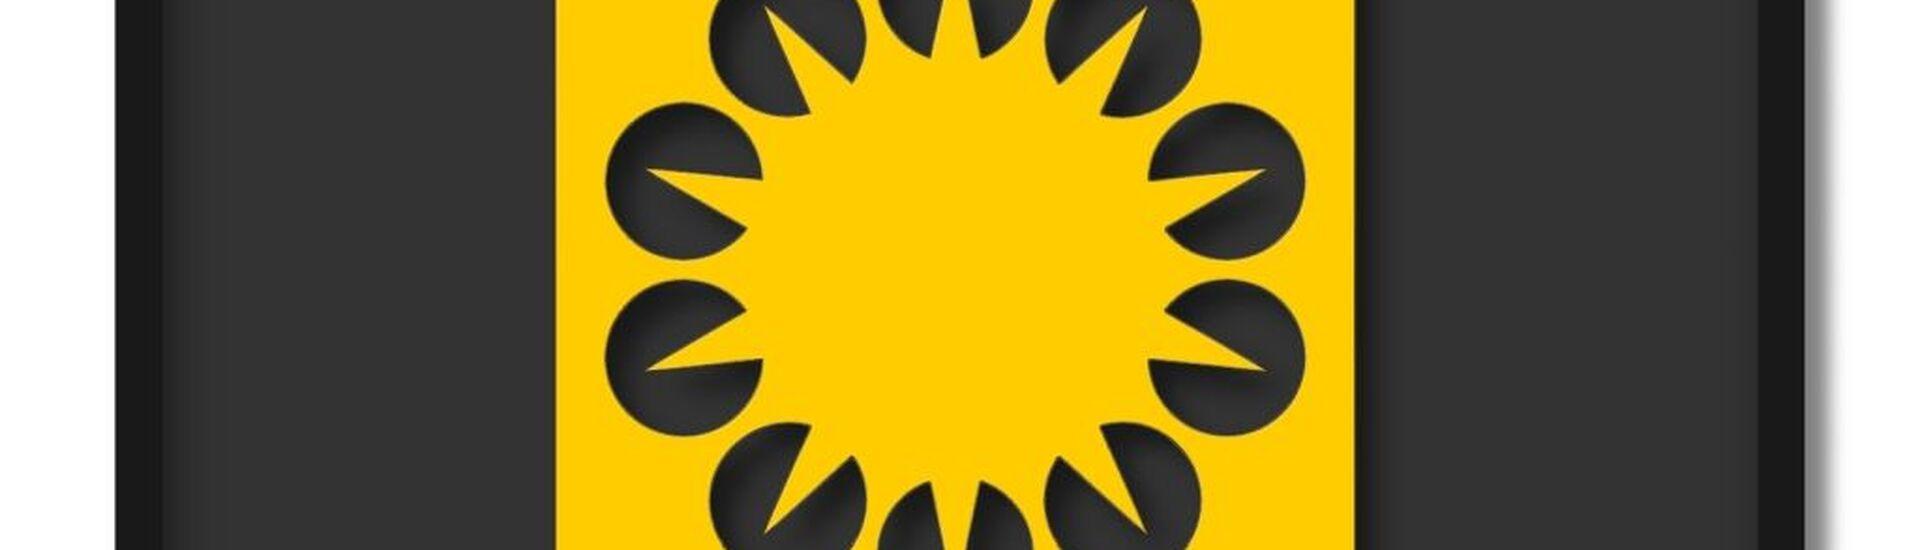 "Bürgerplakette ""Ortenberger Sonne"""